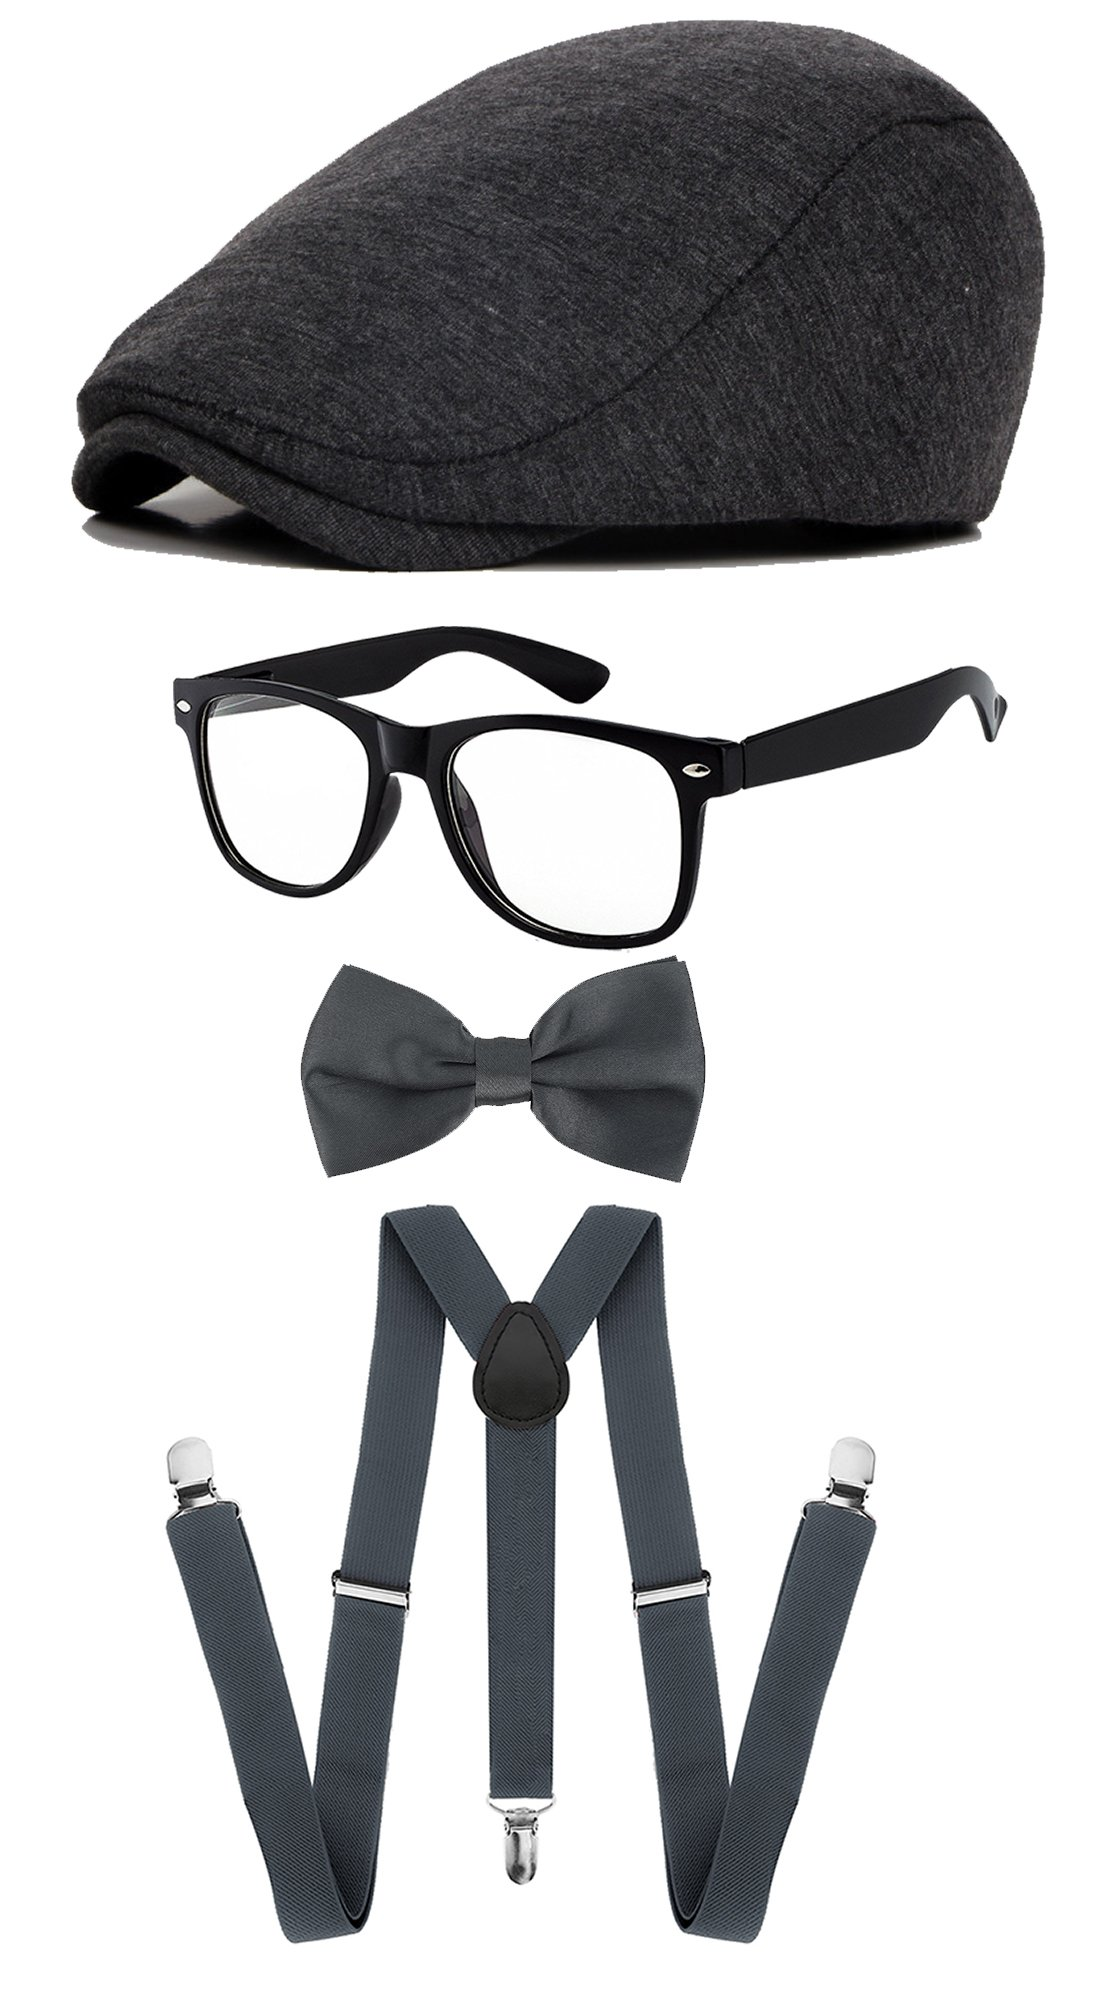 Classic Gatsby Newsboy Ivy Hat,Suspenders Y-Back Trouser Braces,Pre Tied Bow Tie,Non Prescription Glasses (Cotton - Dark Grey)